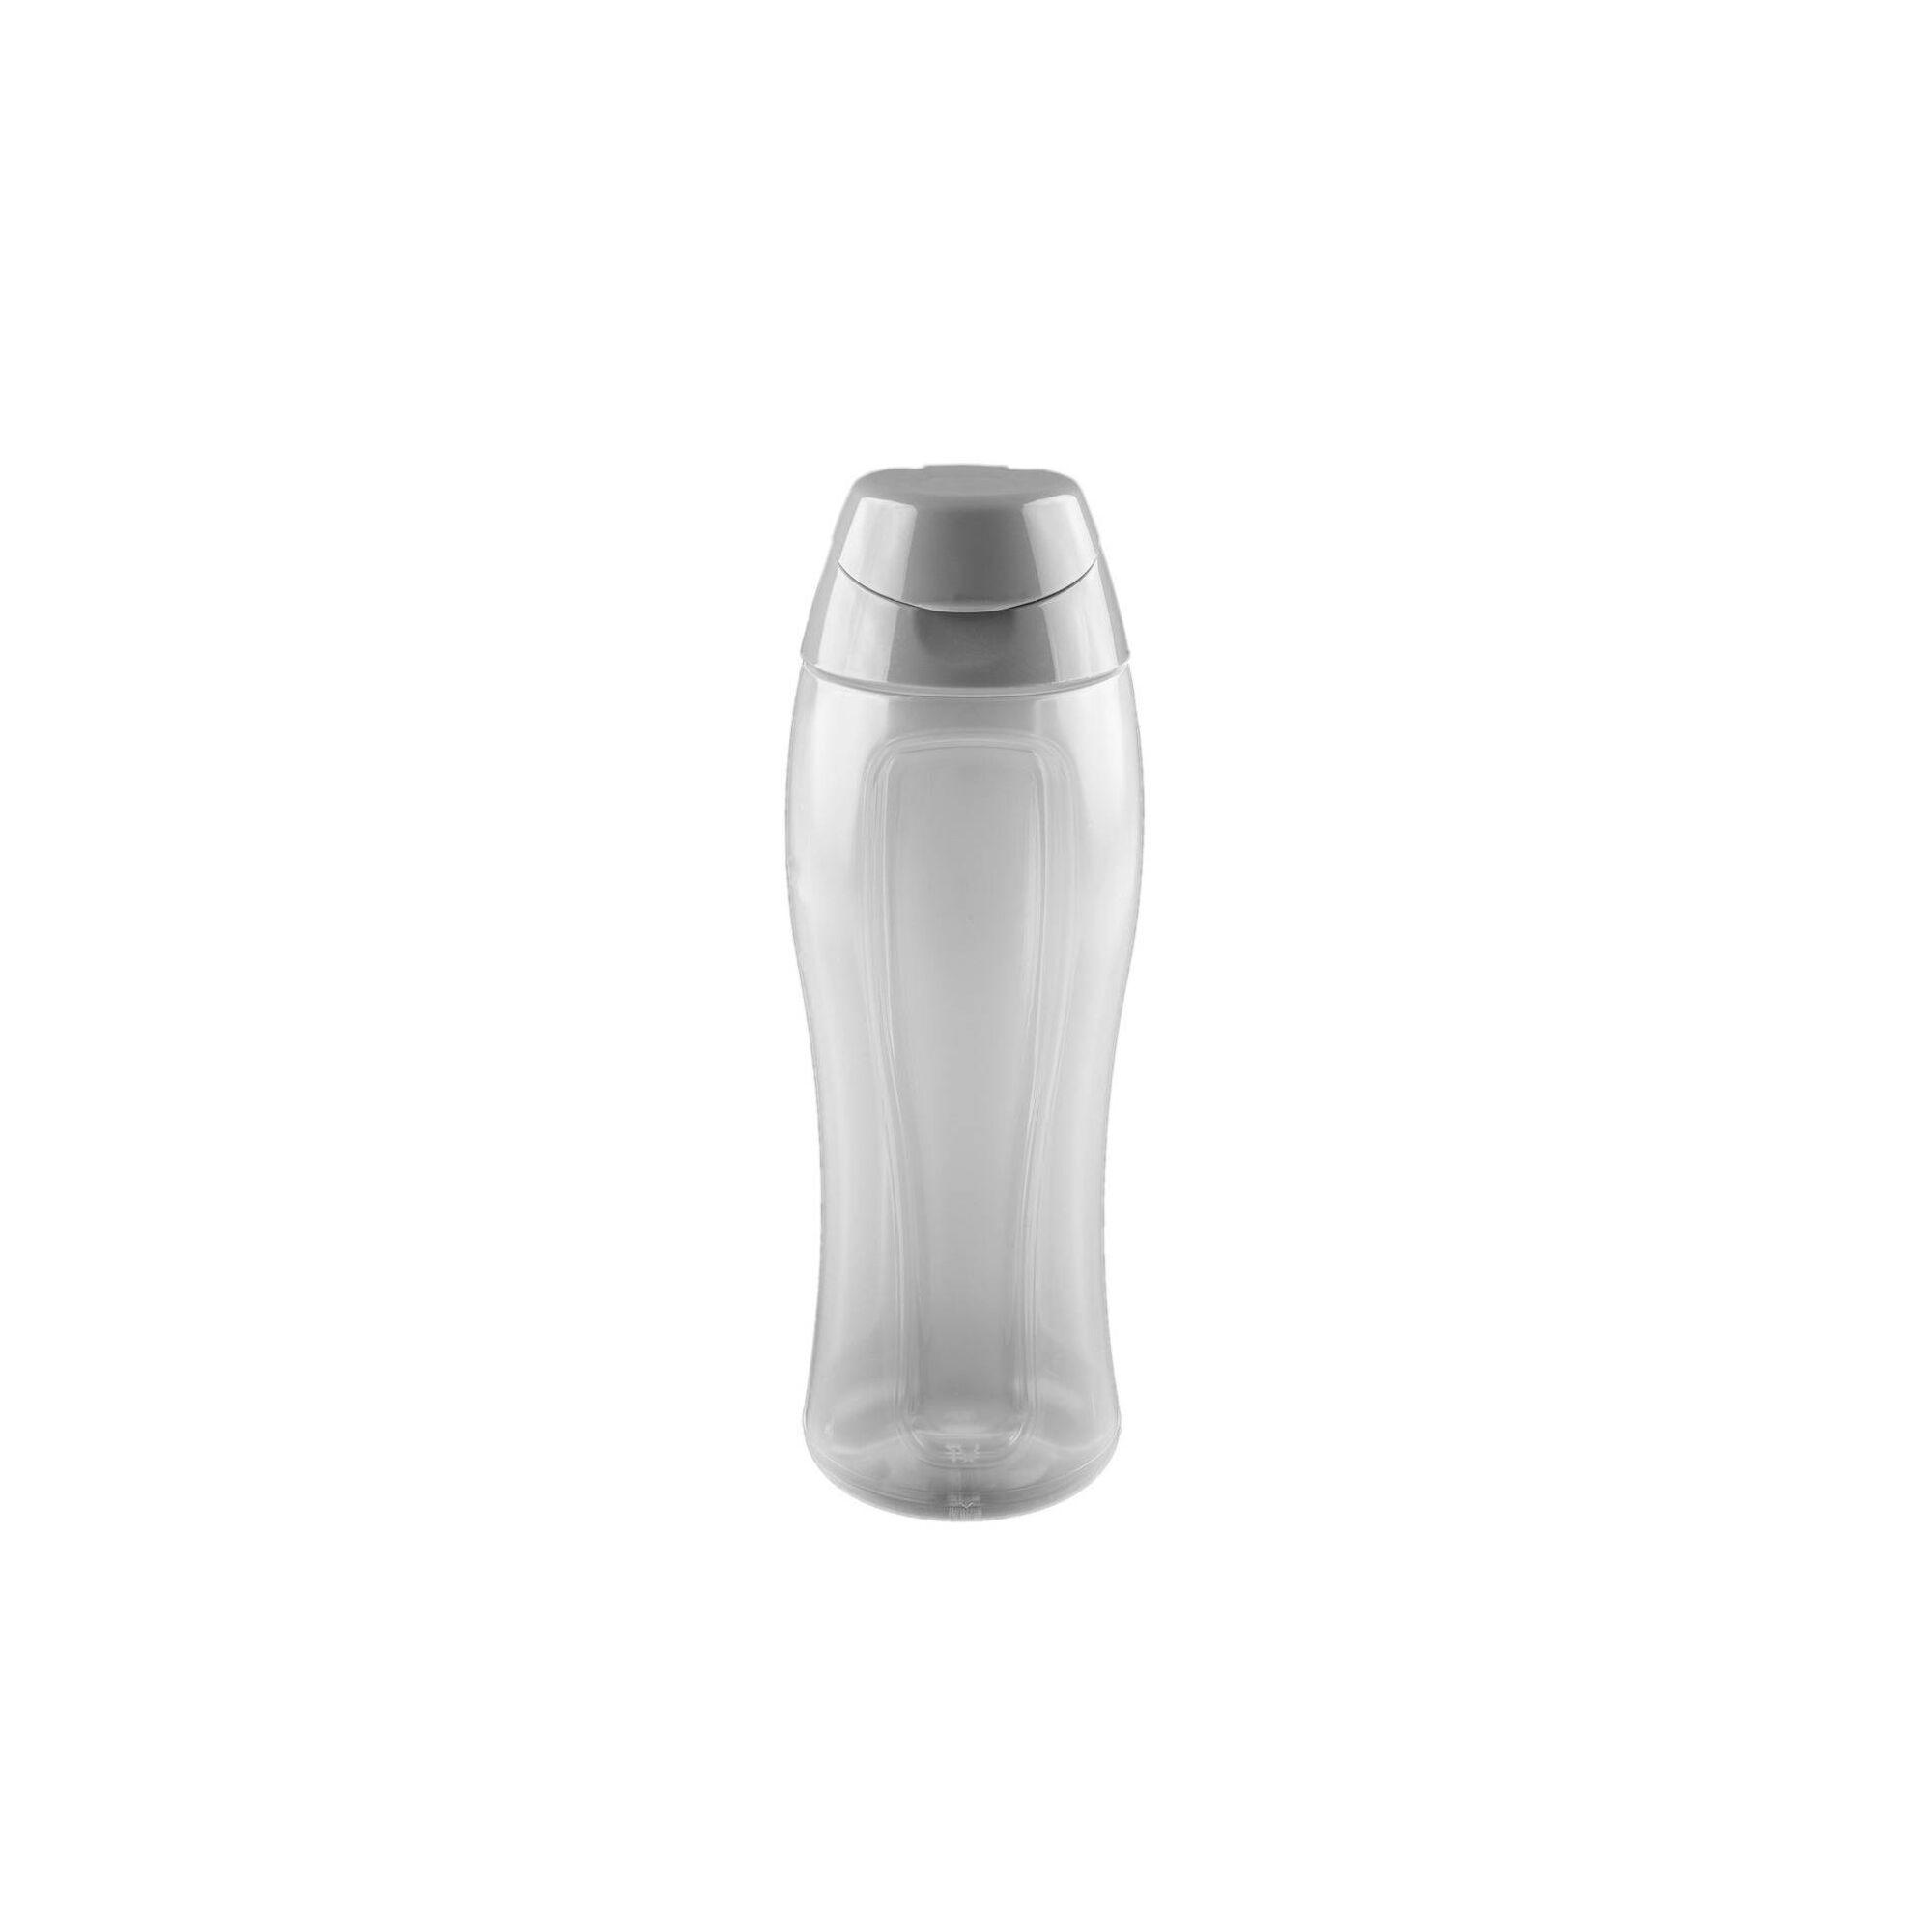 Garrafa Plástico 800ml Cinza Essencial